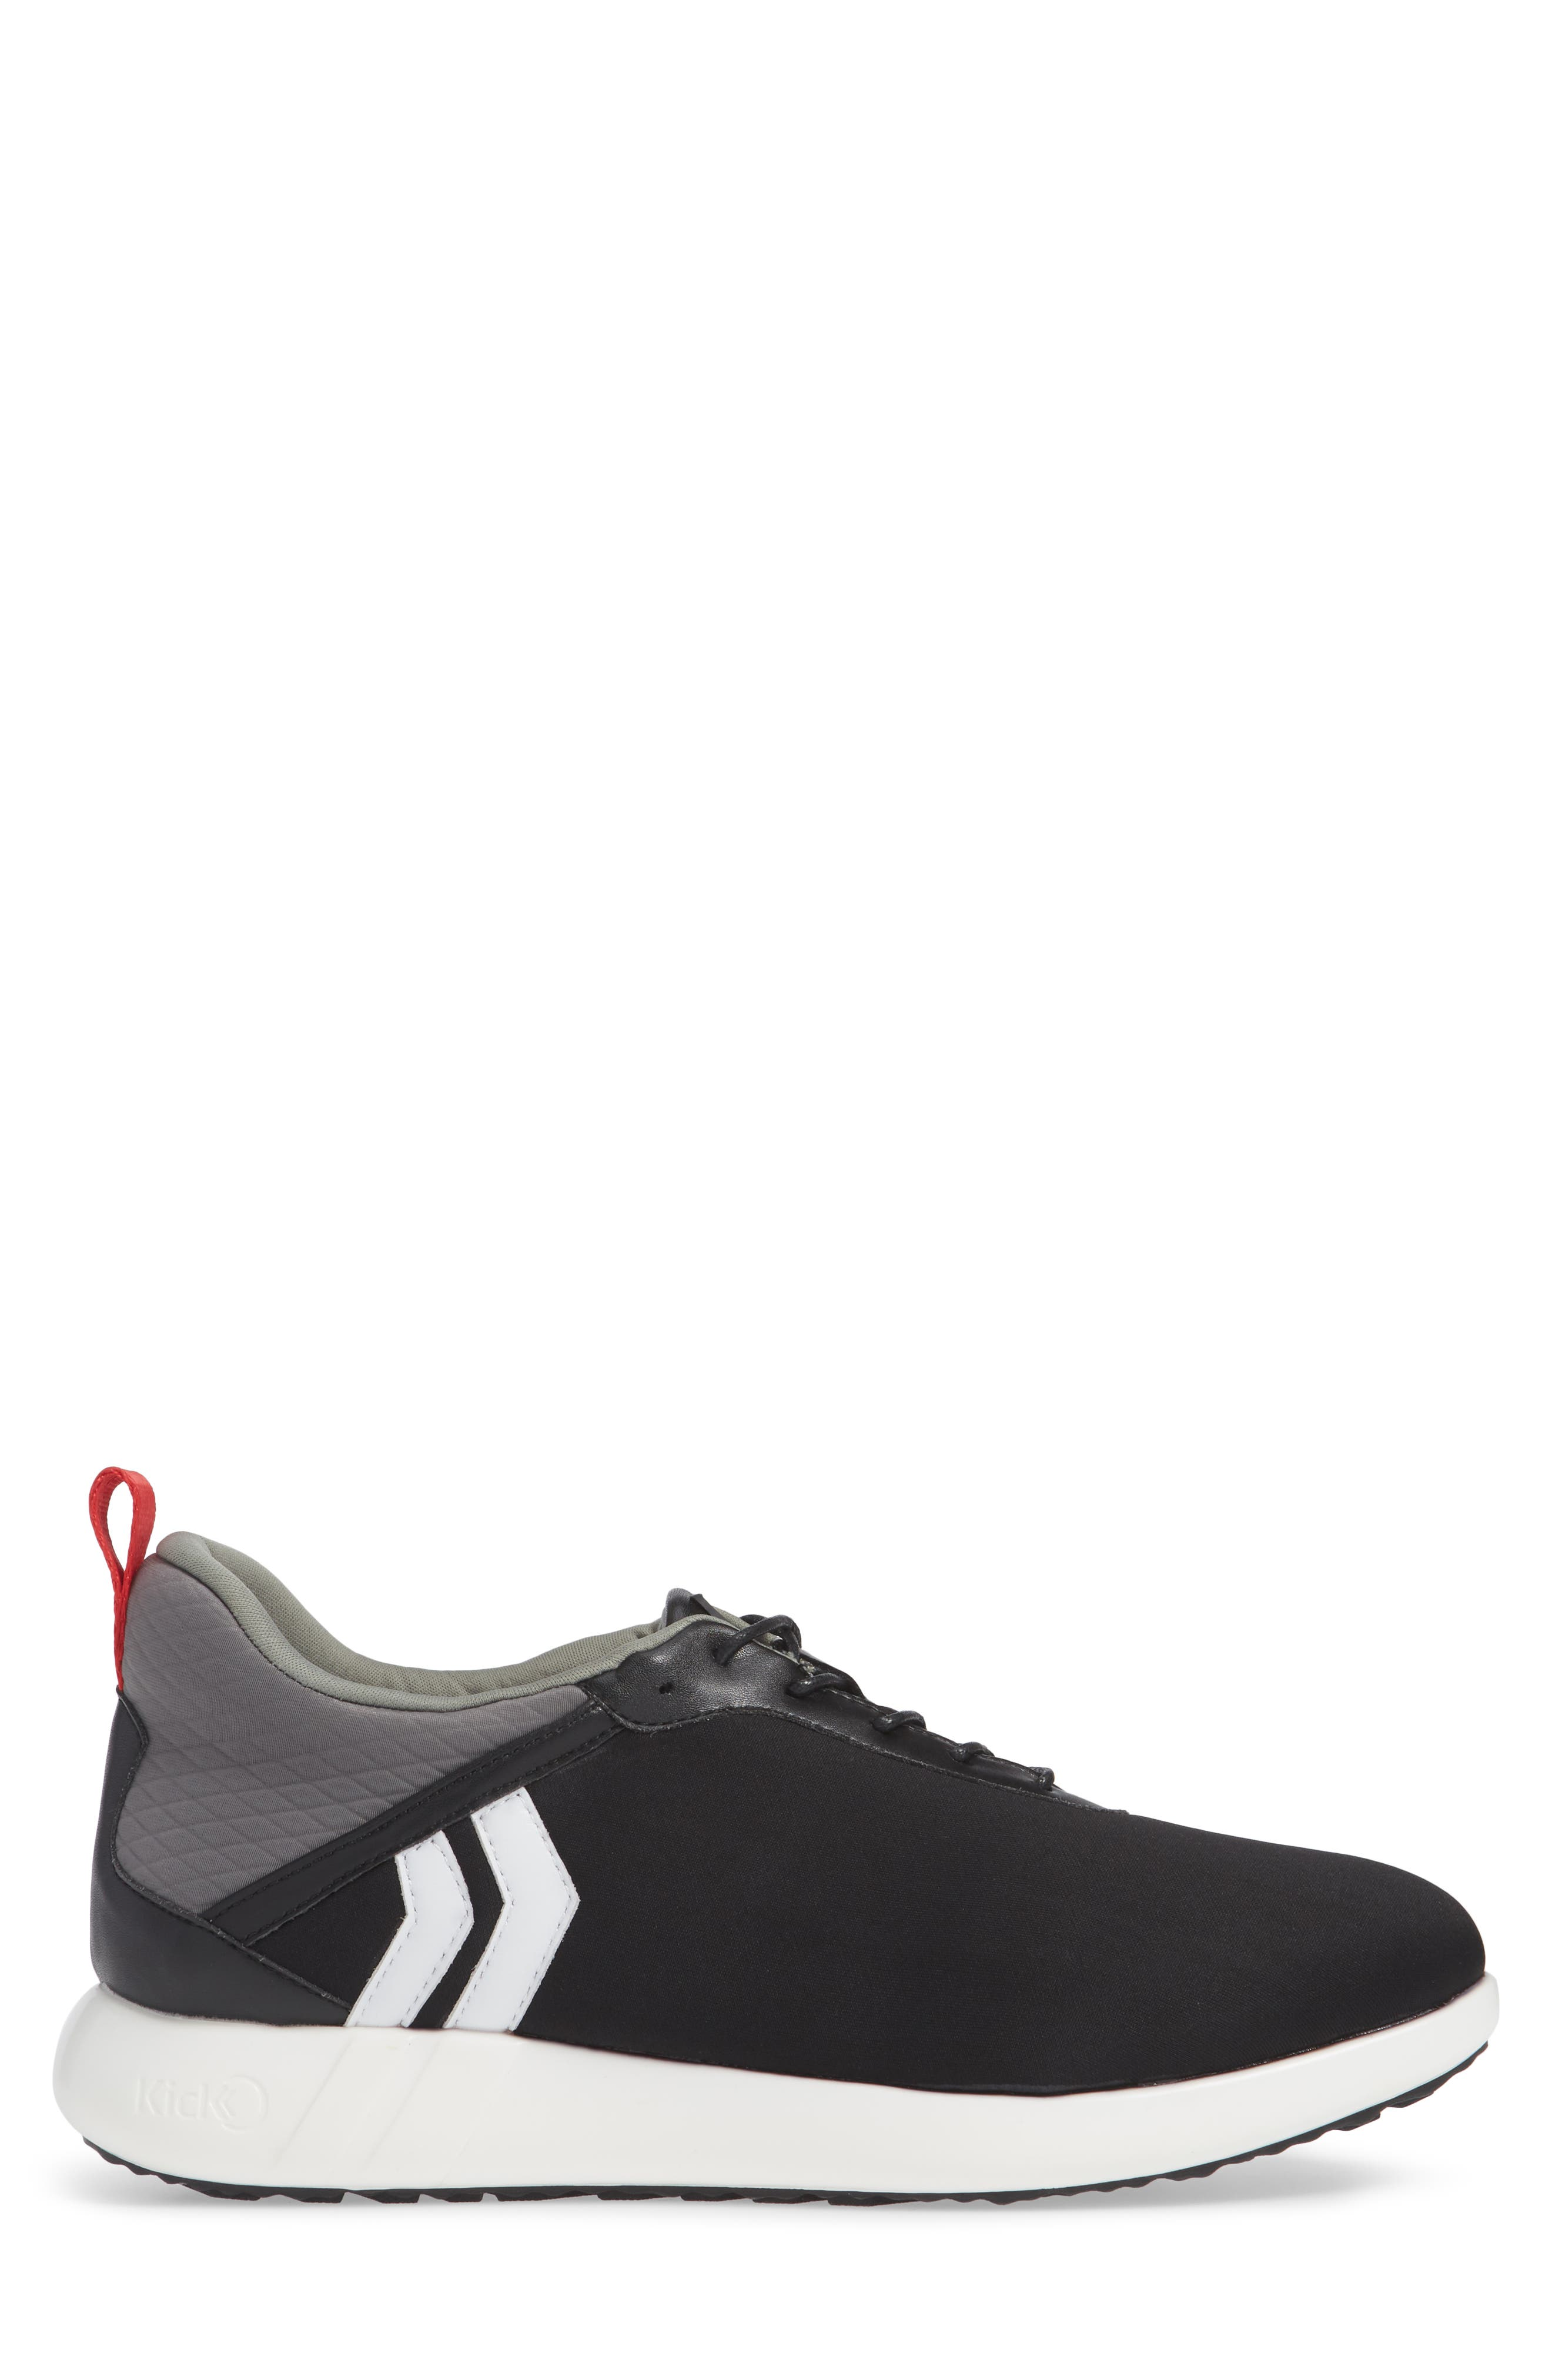 Flash Sneaker,                             Alternate thumbnail 3, color,                             001